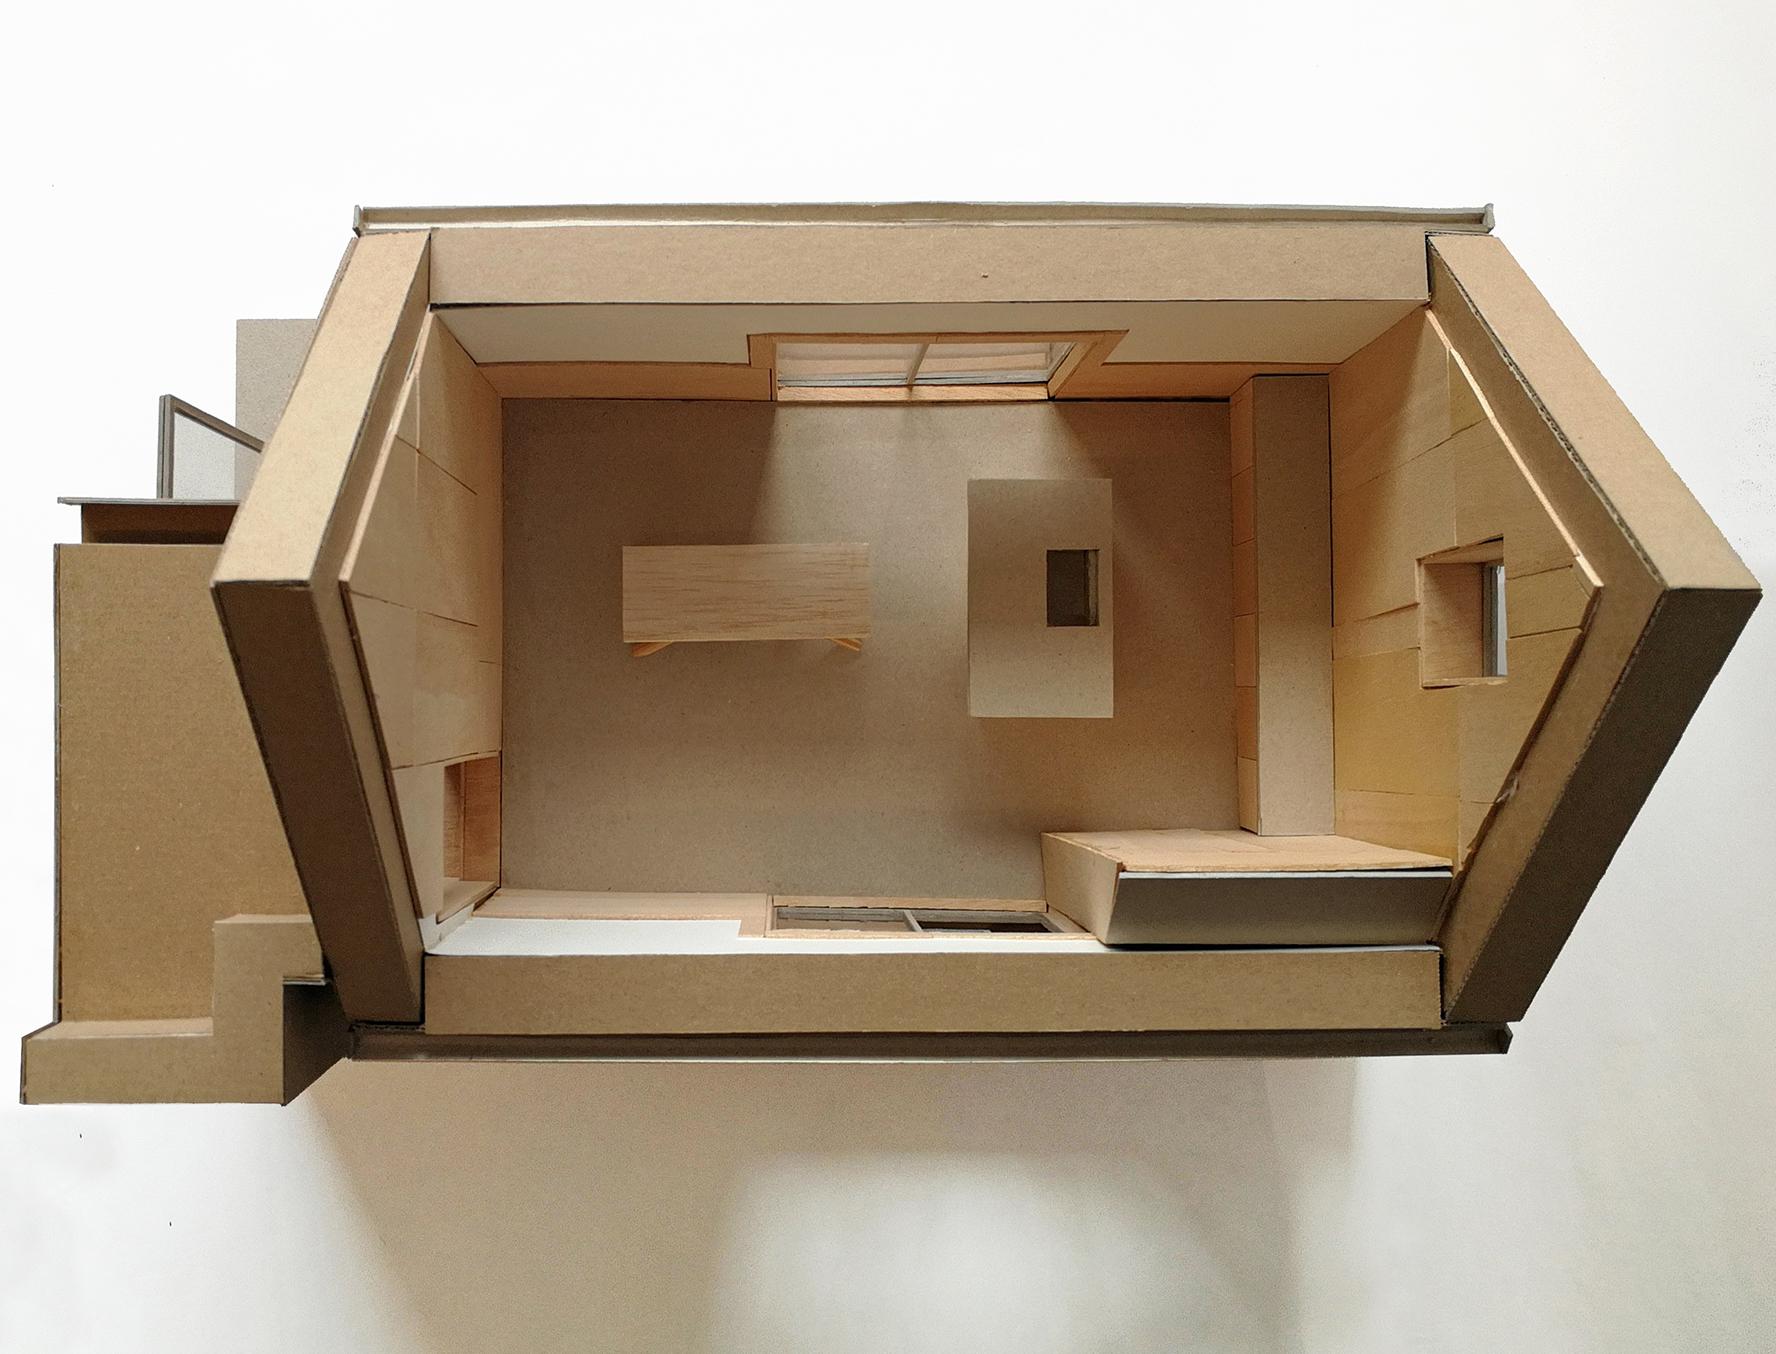 harper-perry-architects-barn-conversion-model-development-internal-layout-open-kitchen-plan